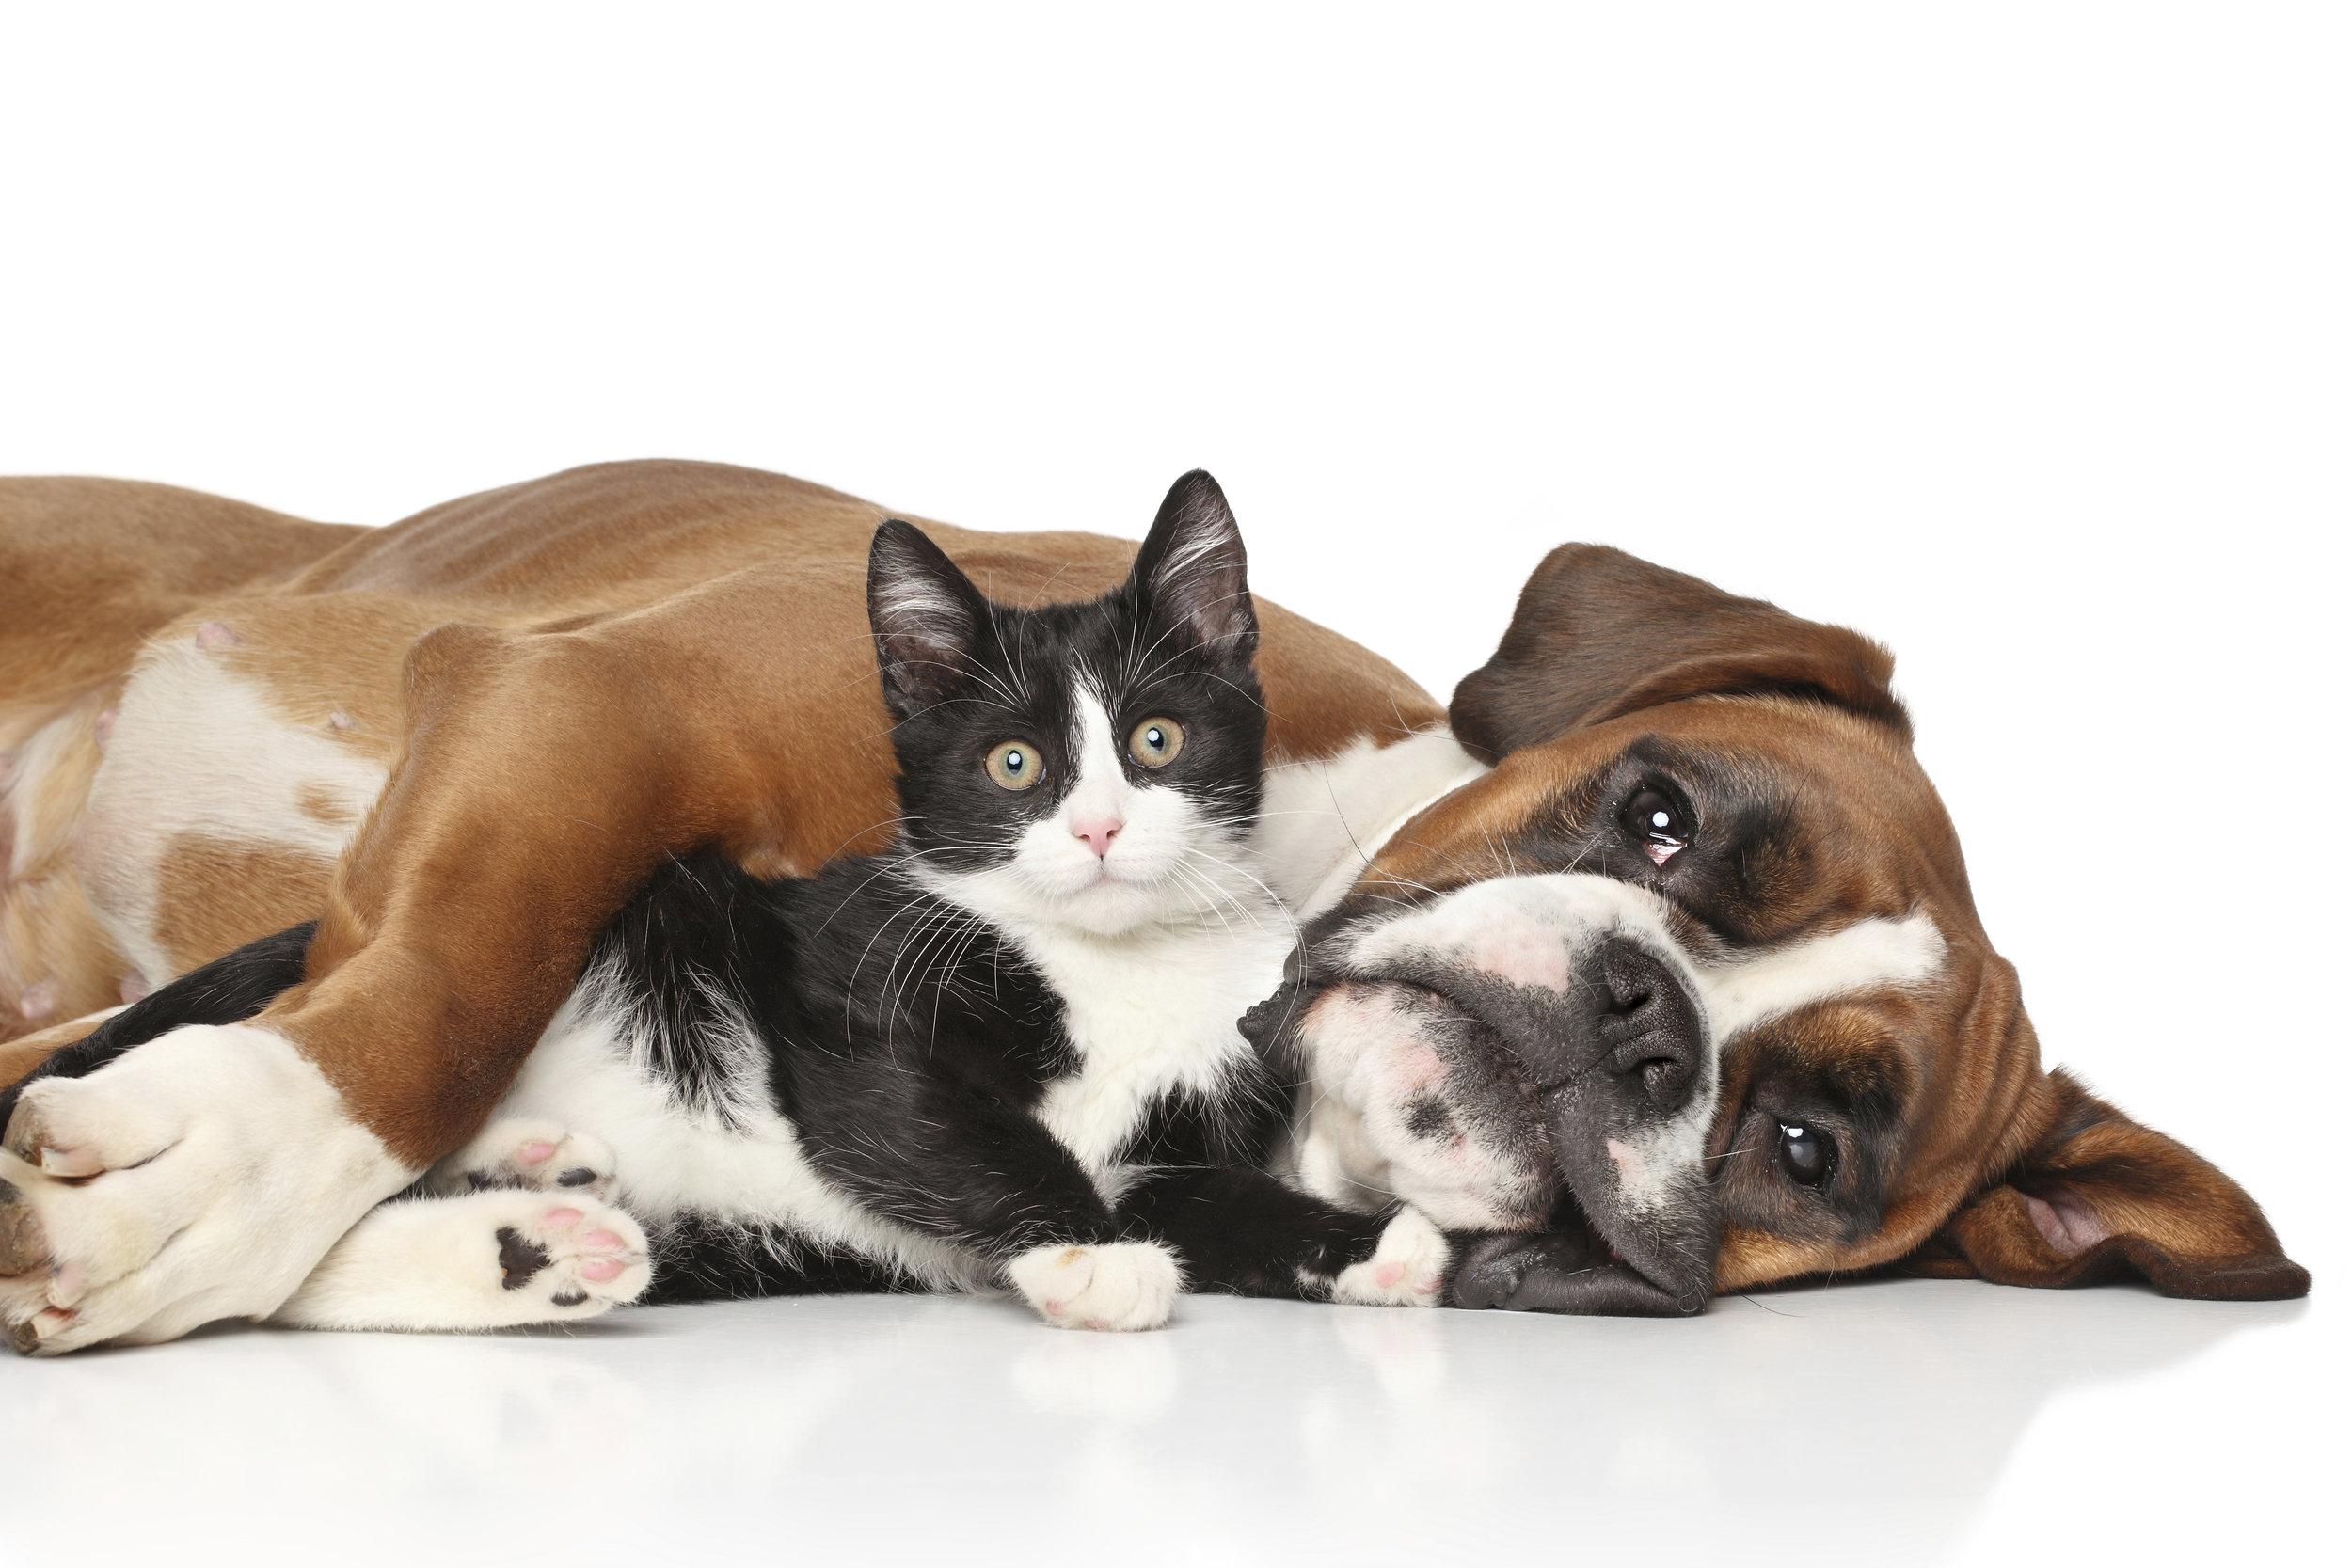 Cat-and-dog-together-000056628486_XXXLarge.jpg